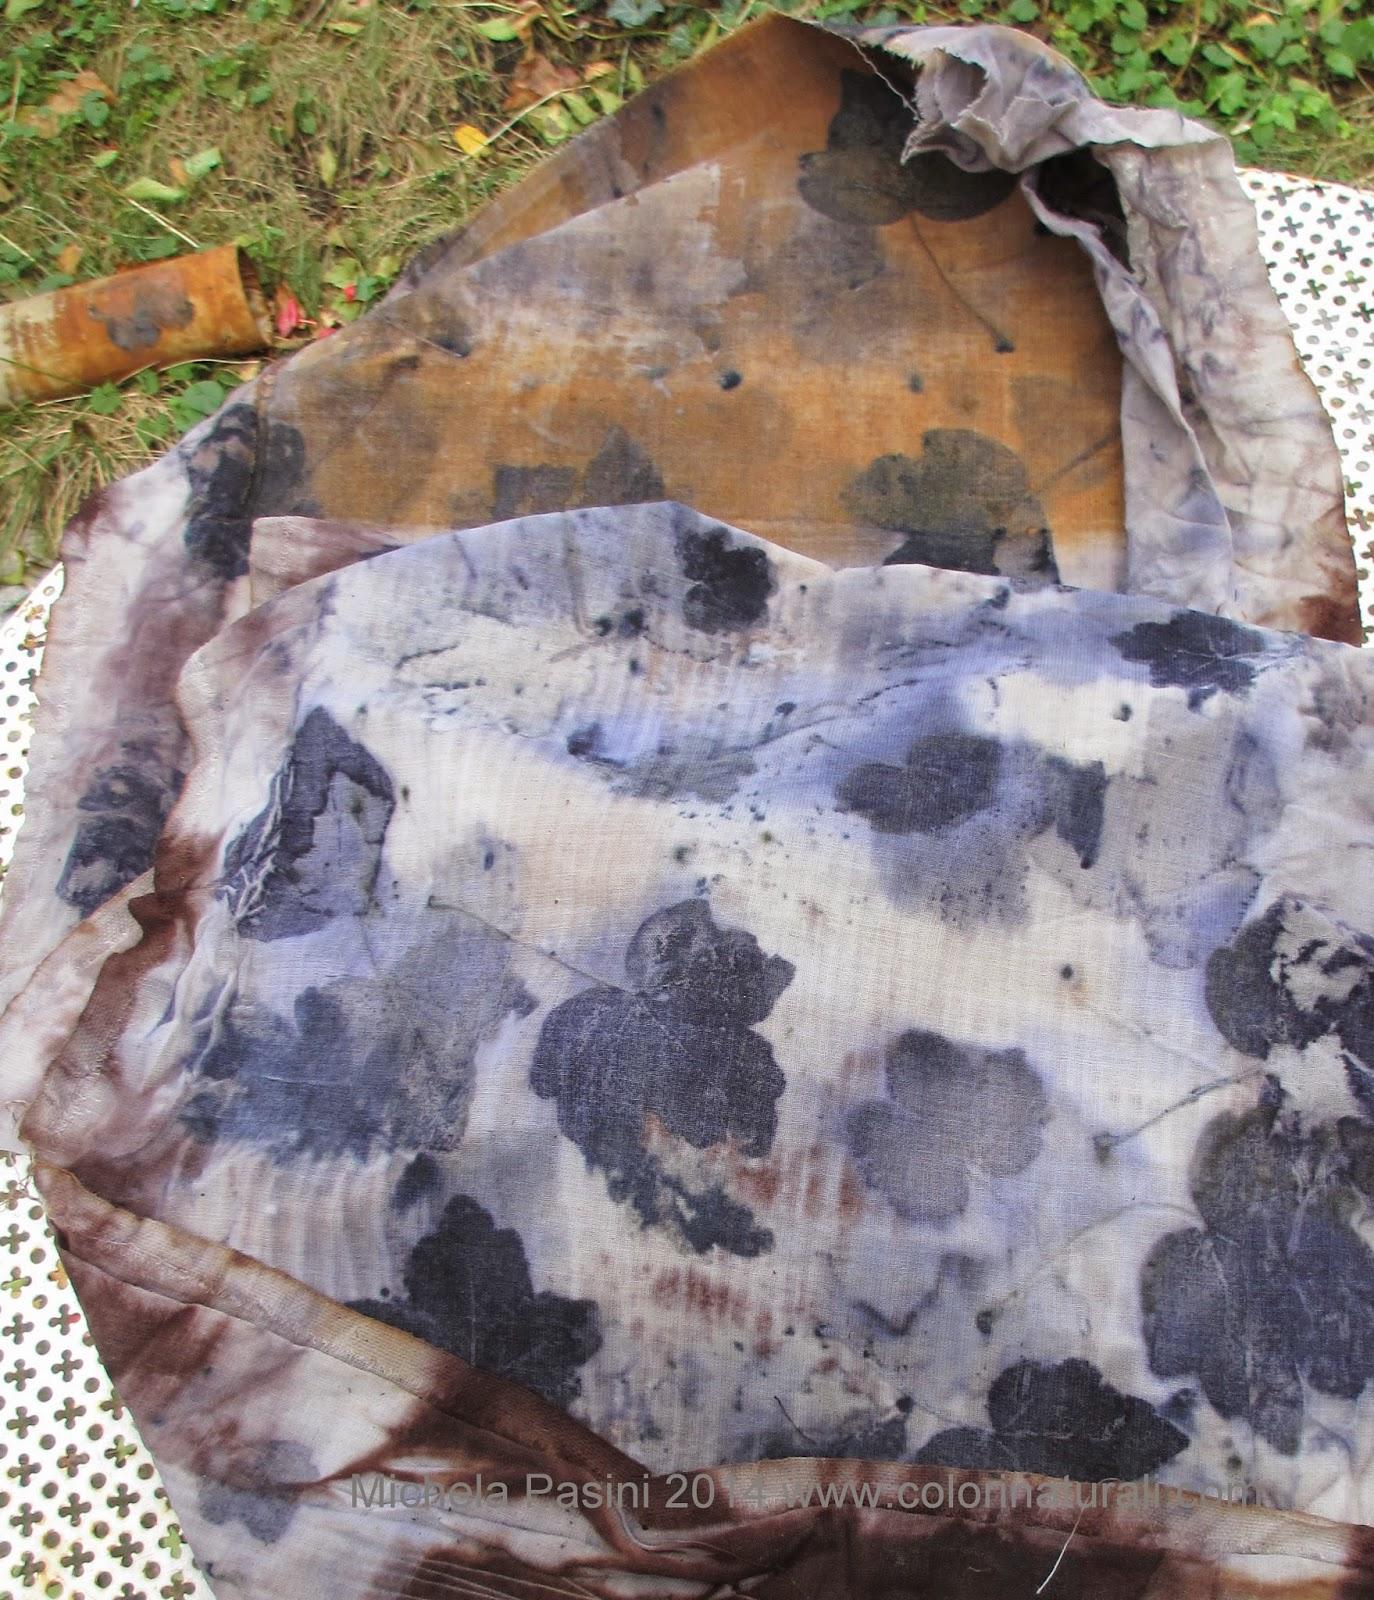 ecoprint ecoprinting abbigliamento tessuti